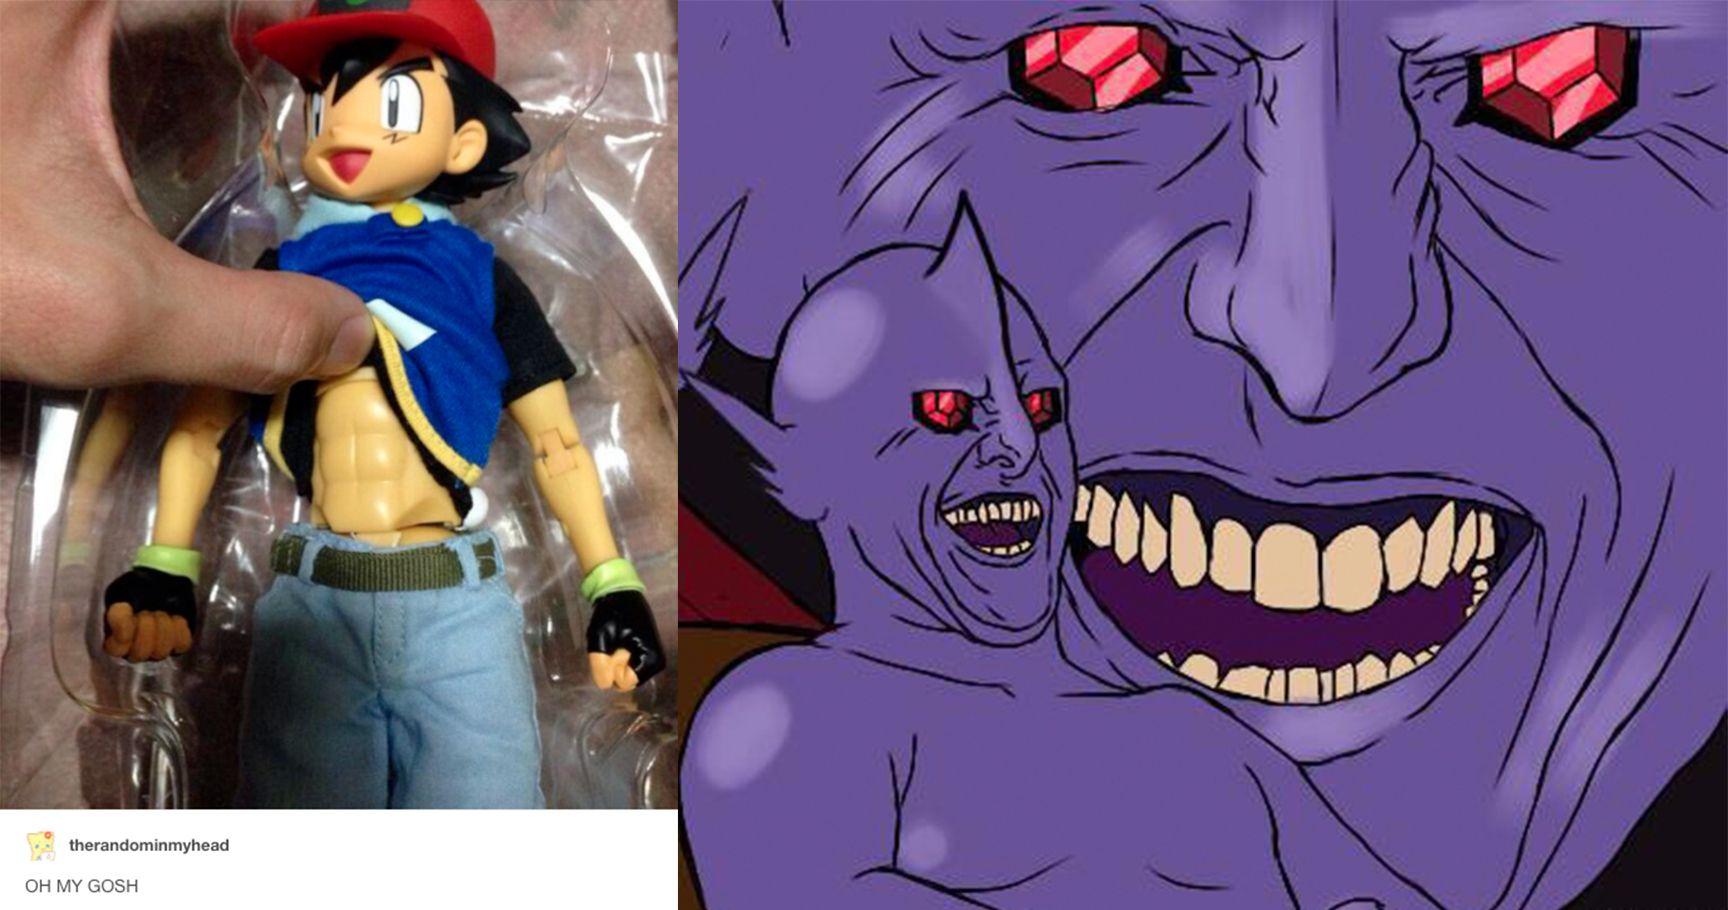 15 Tumblr Posts That Will Make Any Pokemon Fan LOL